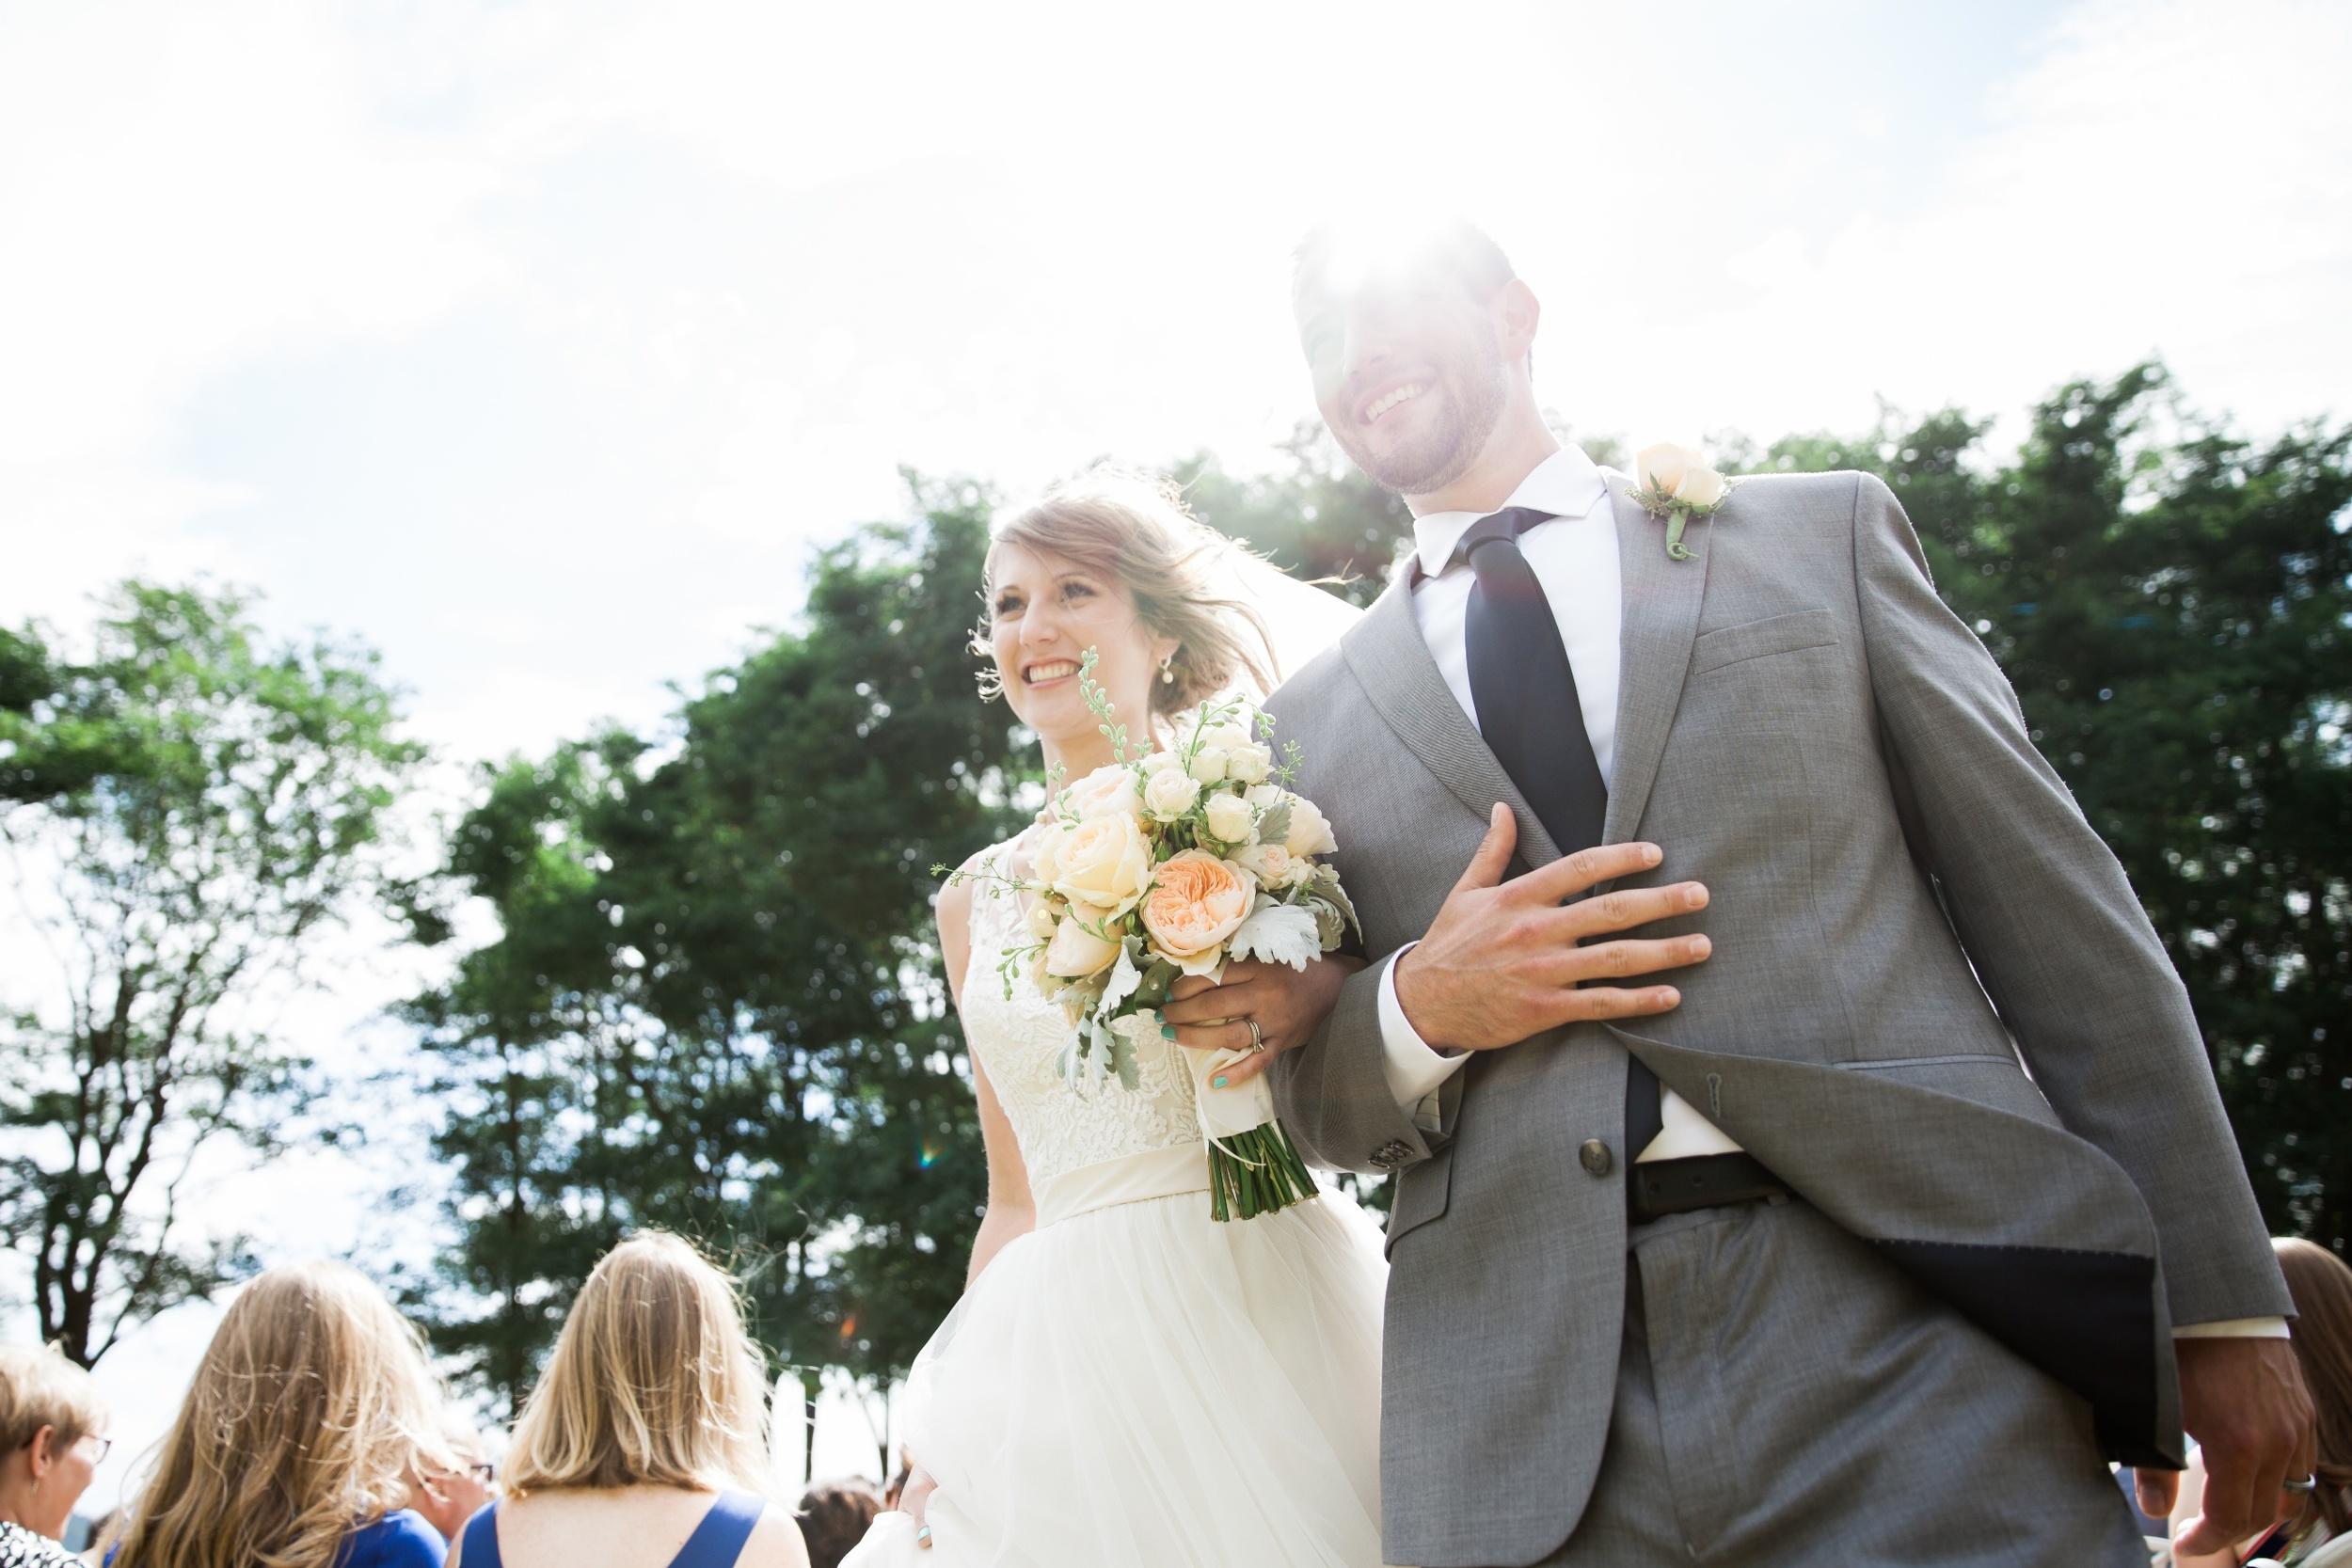 seattle wedding photographer film photography golden garden gardens state park ocean sand bride groom 31.jpg